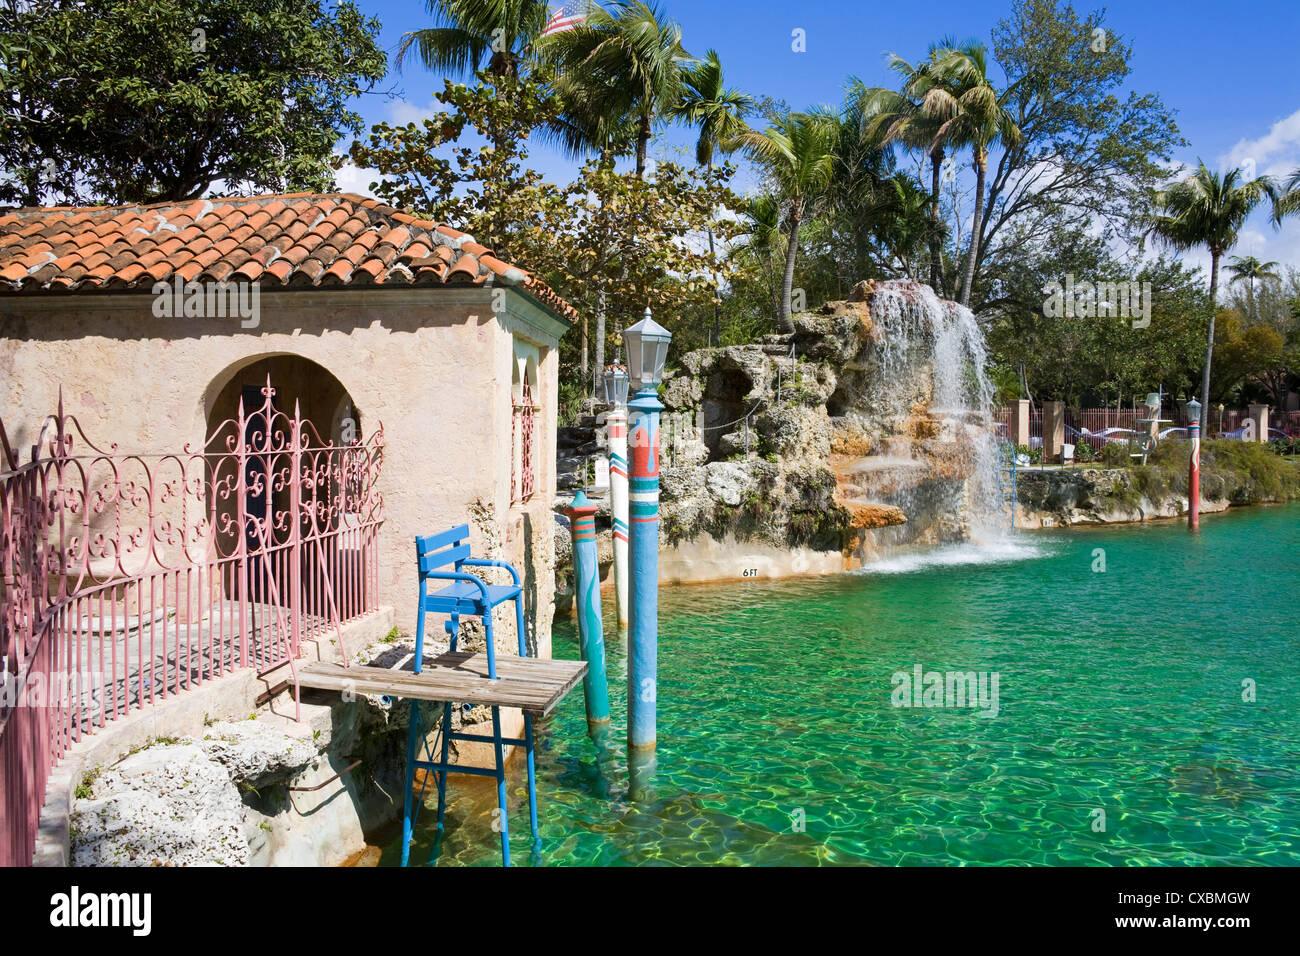 Venetian Pool, Coral Gables, Miami, Florida, United States of America, North America - Stock Image